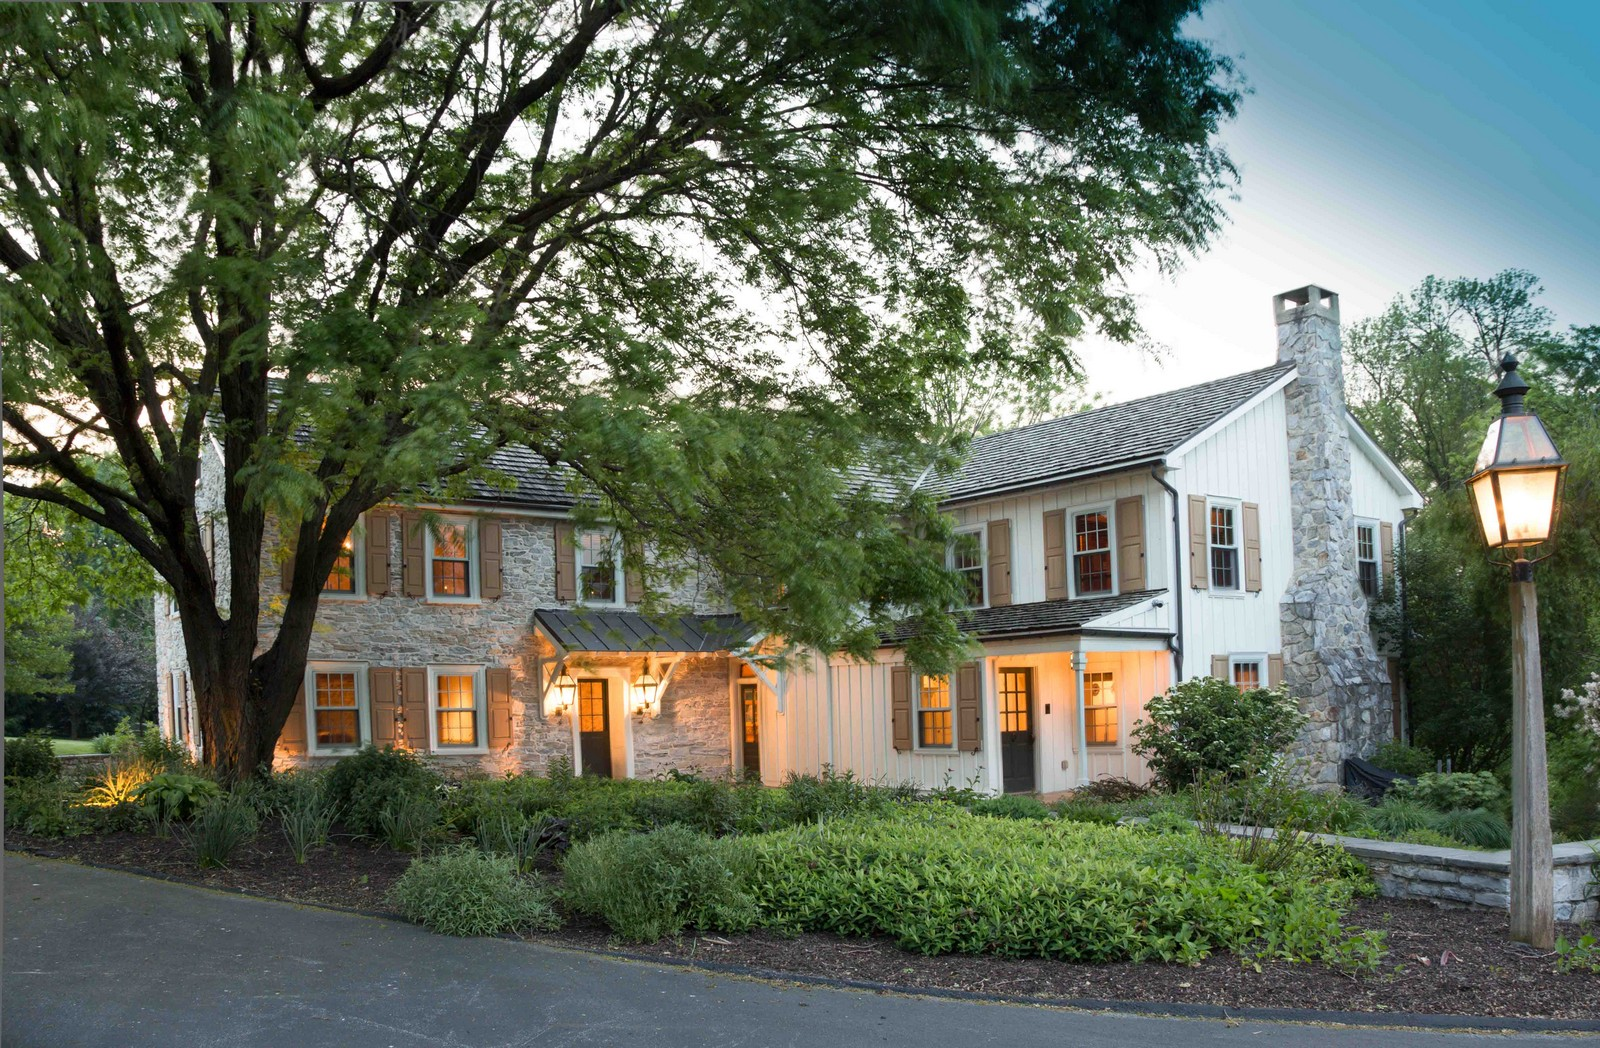 Single Family Home for Sale at Happy Farm 286 Conestoga Creek Rd. East Earl, Pennsylvania 17519 United States